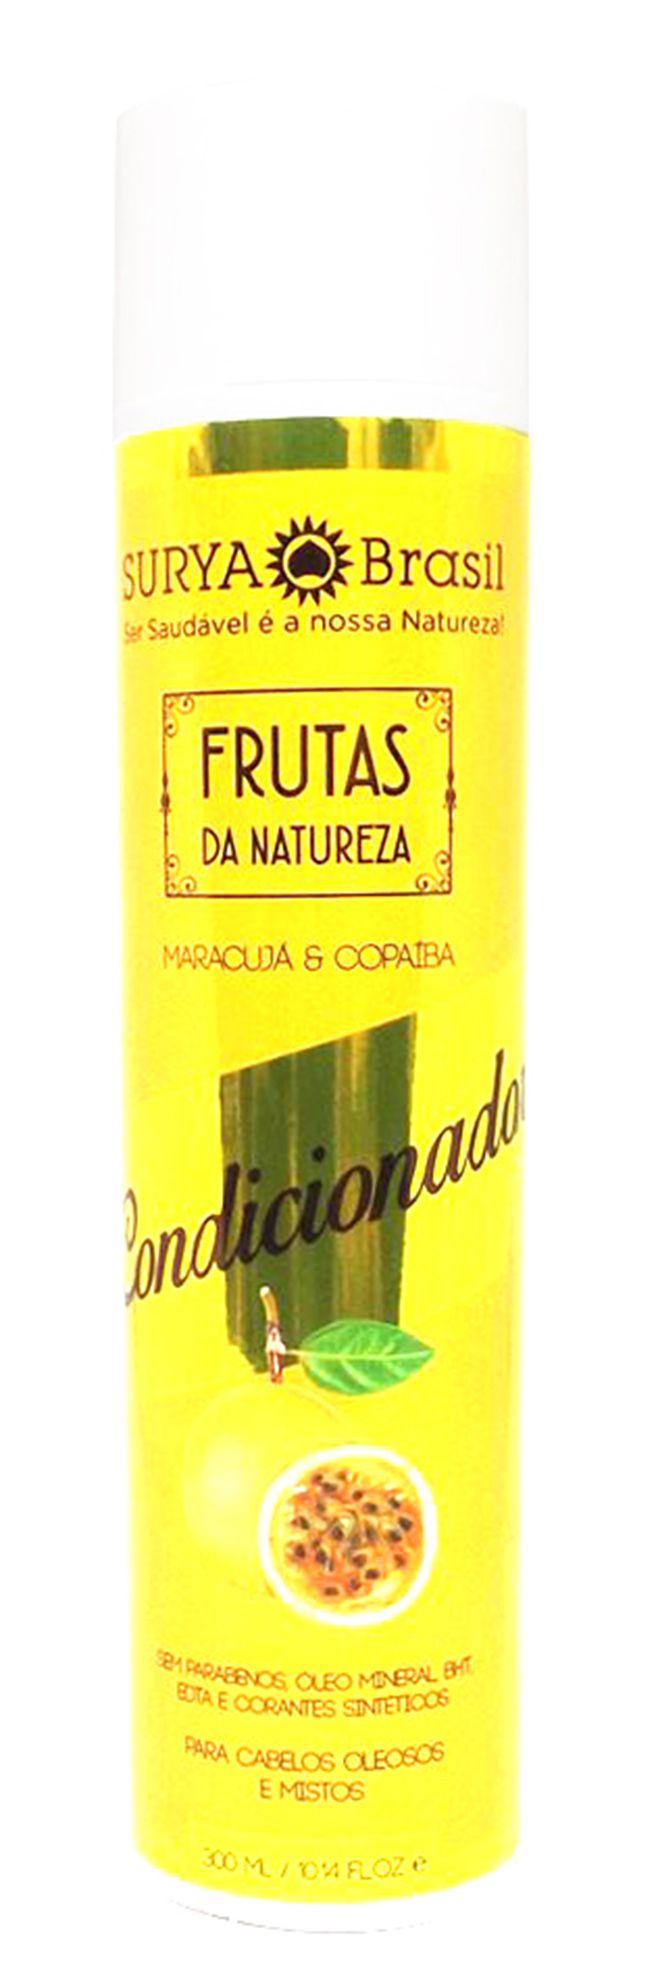 Surya Brasil - Maracujá & Copaíba - Condicionador Frutas da Natureza - 300 ml